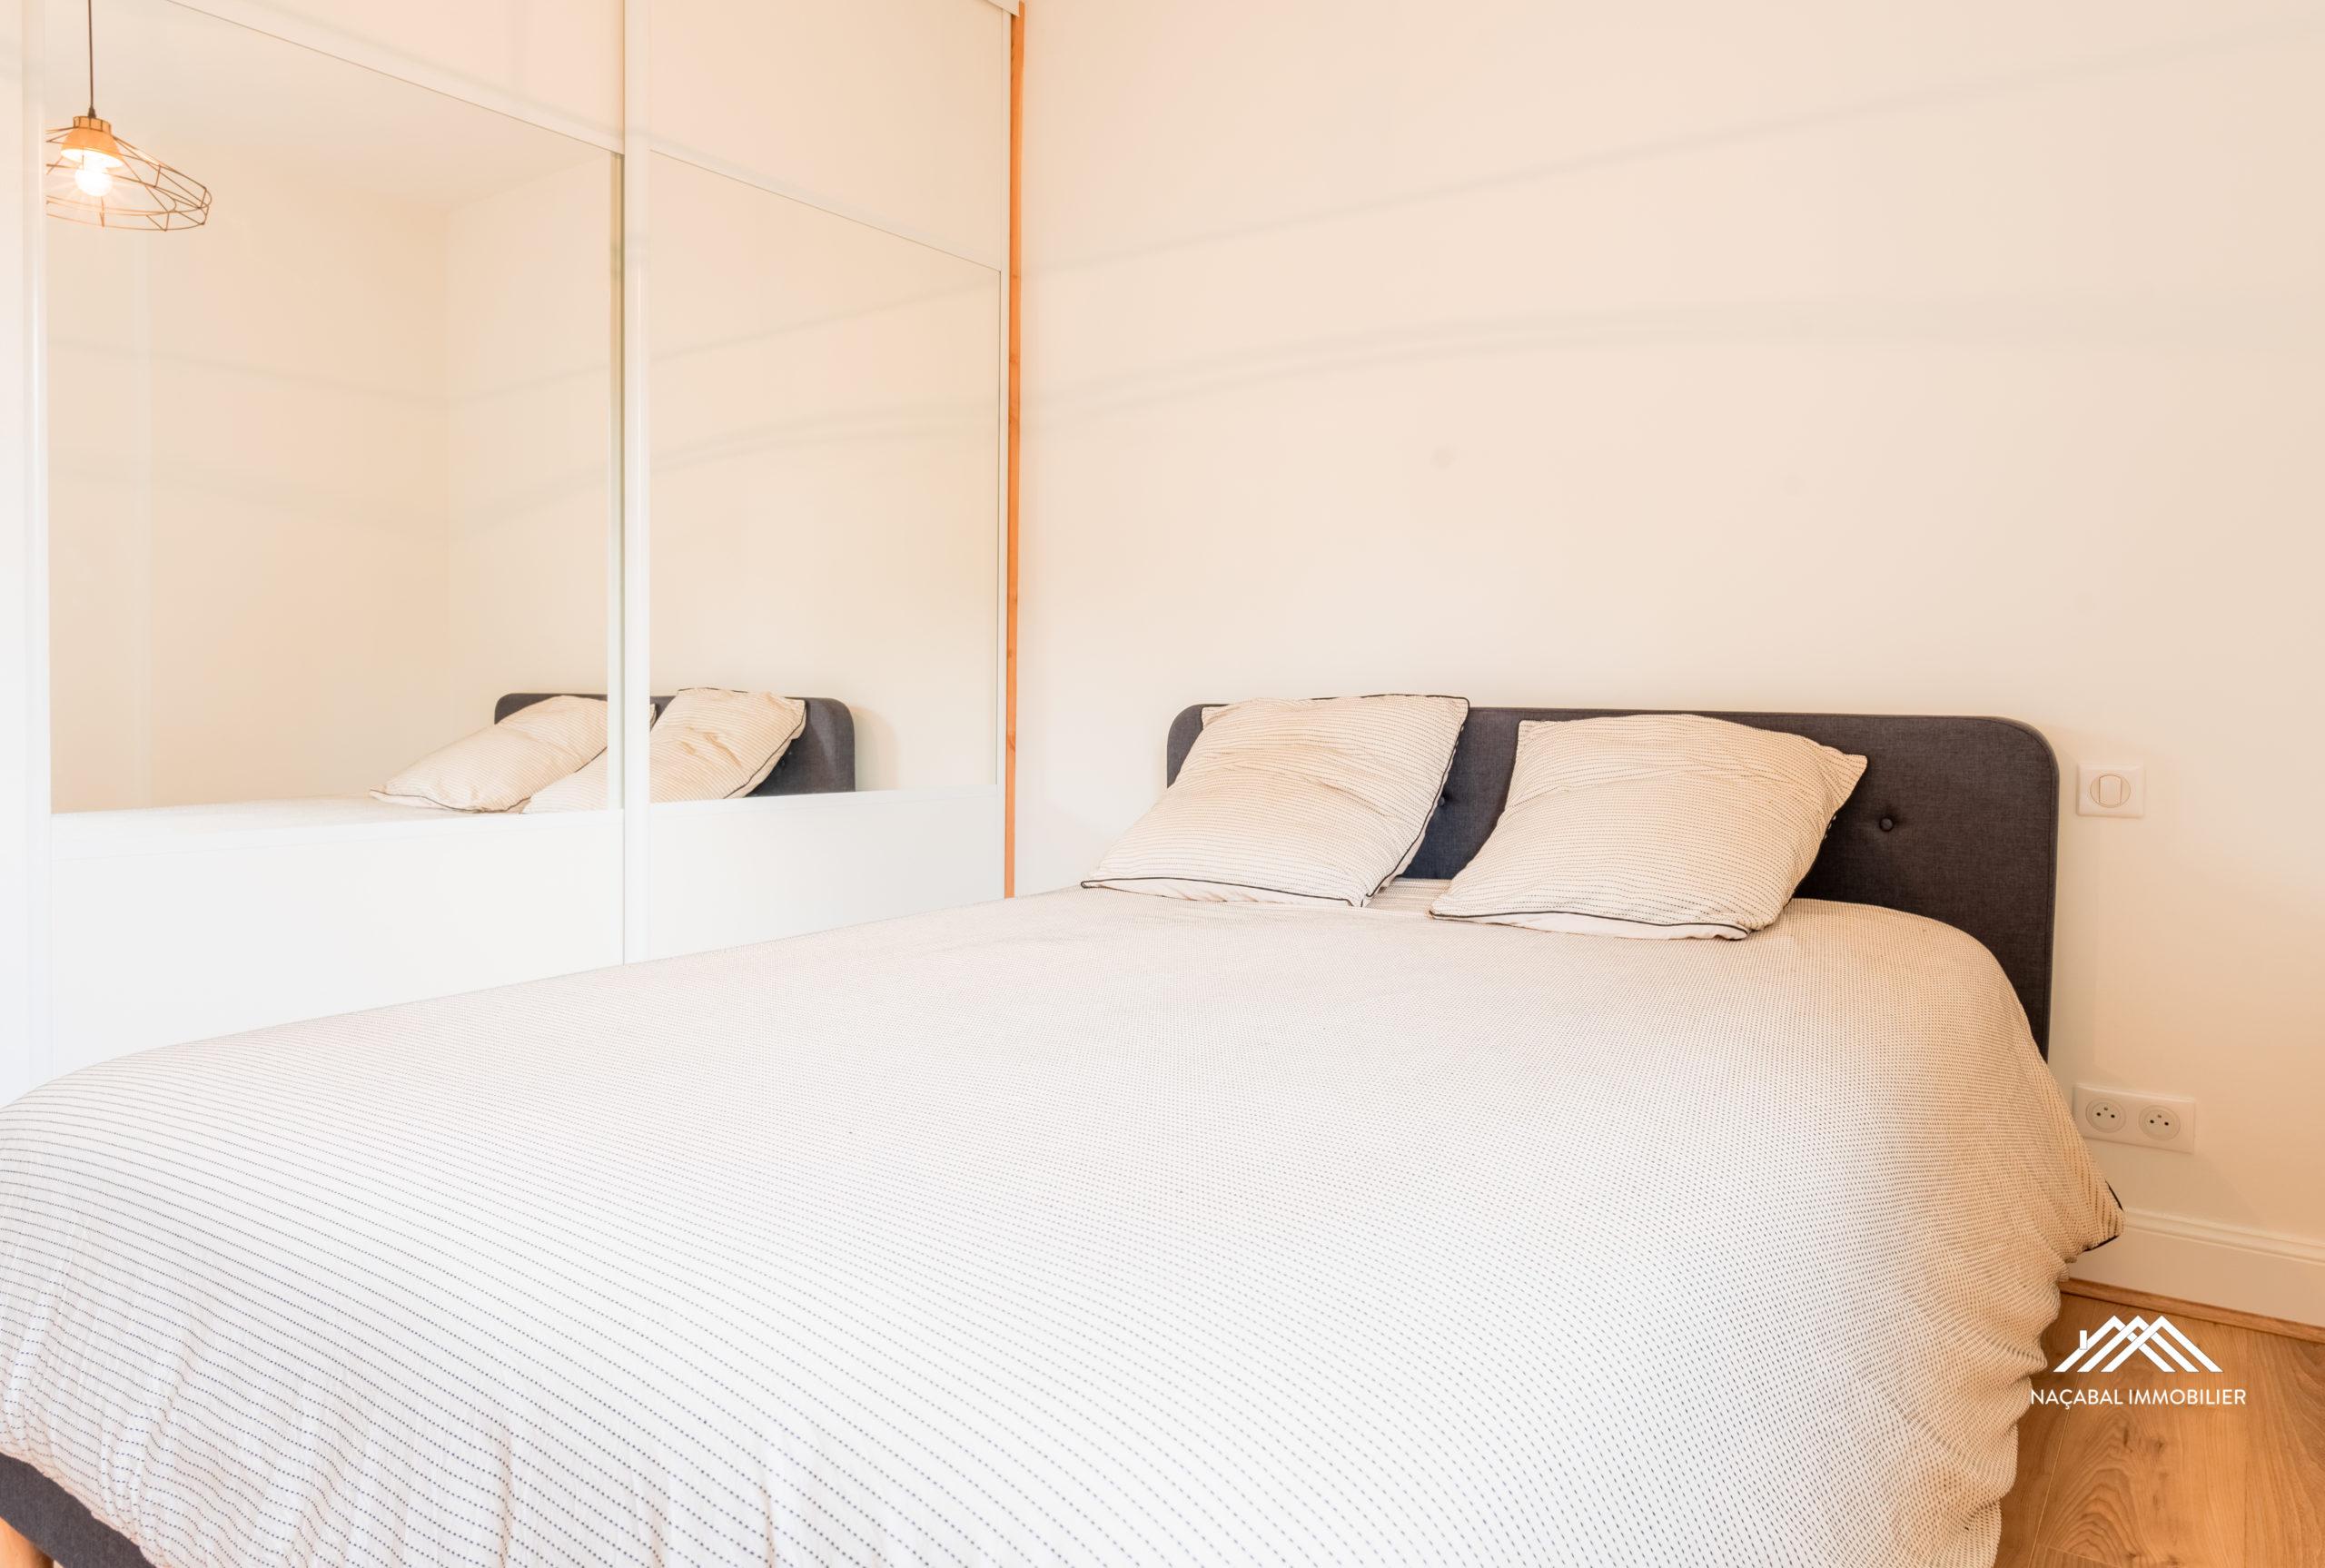 investir immobilier pays basque